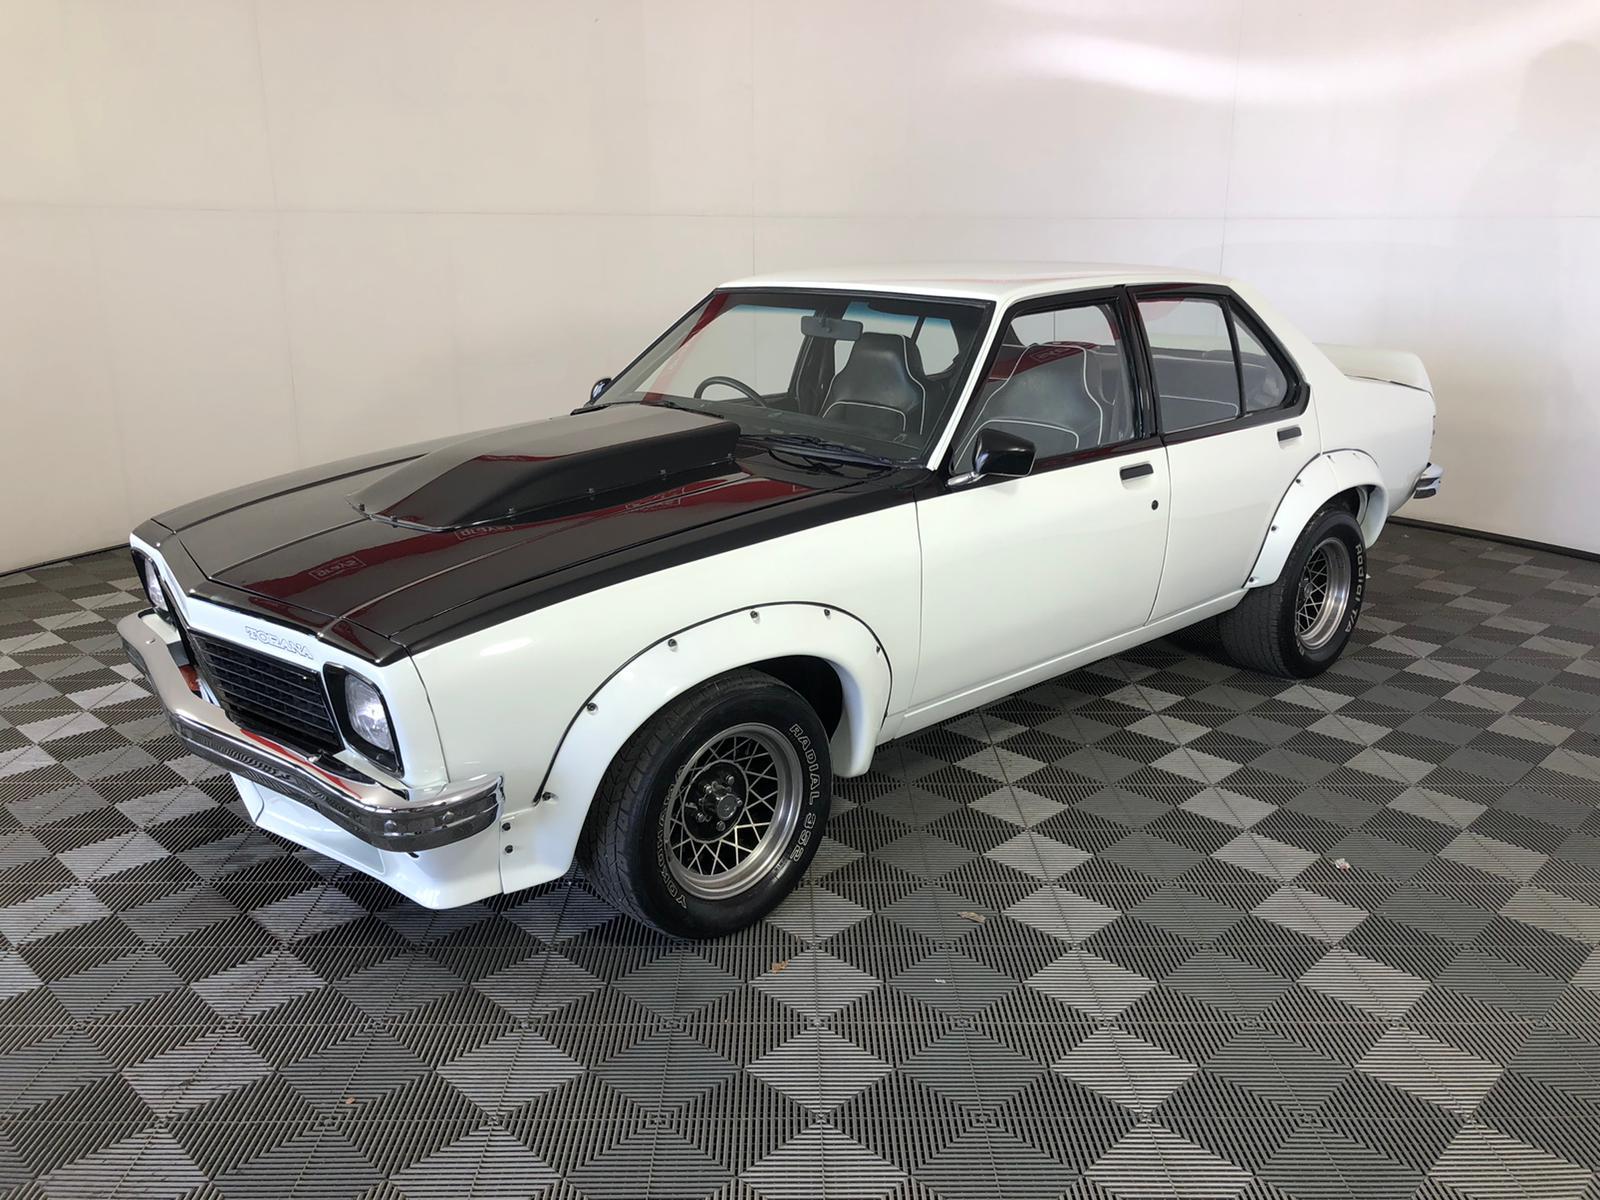 1975 Original Holden Torana LH SLR5000 5.0L Manual, Matching Number